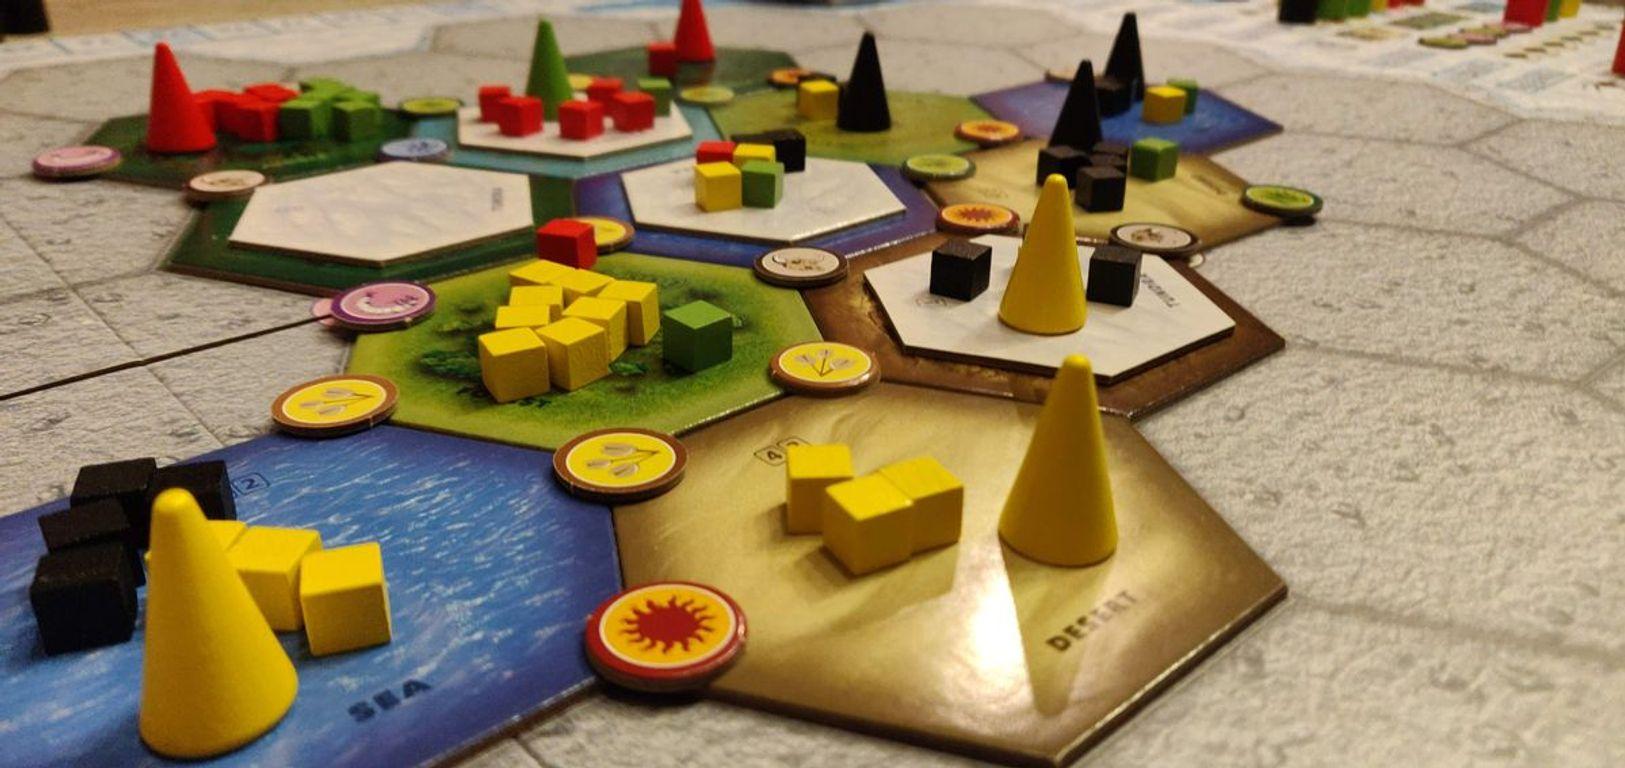 Dominant Species gameplay